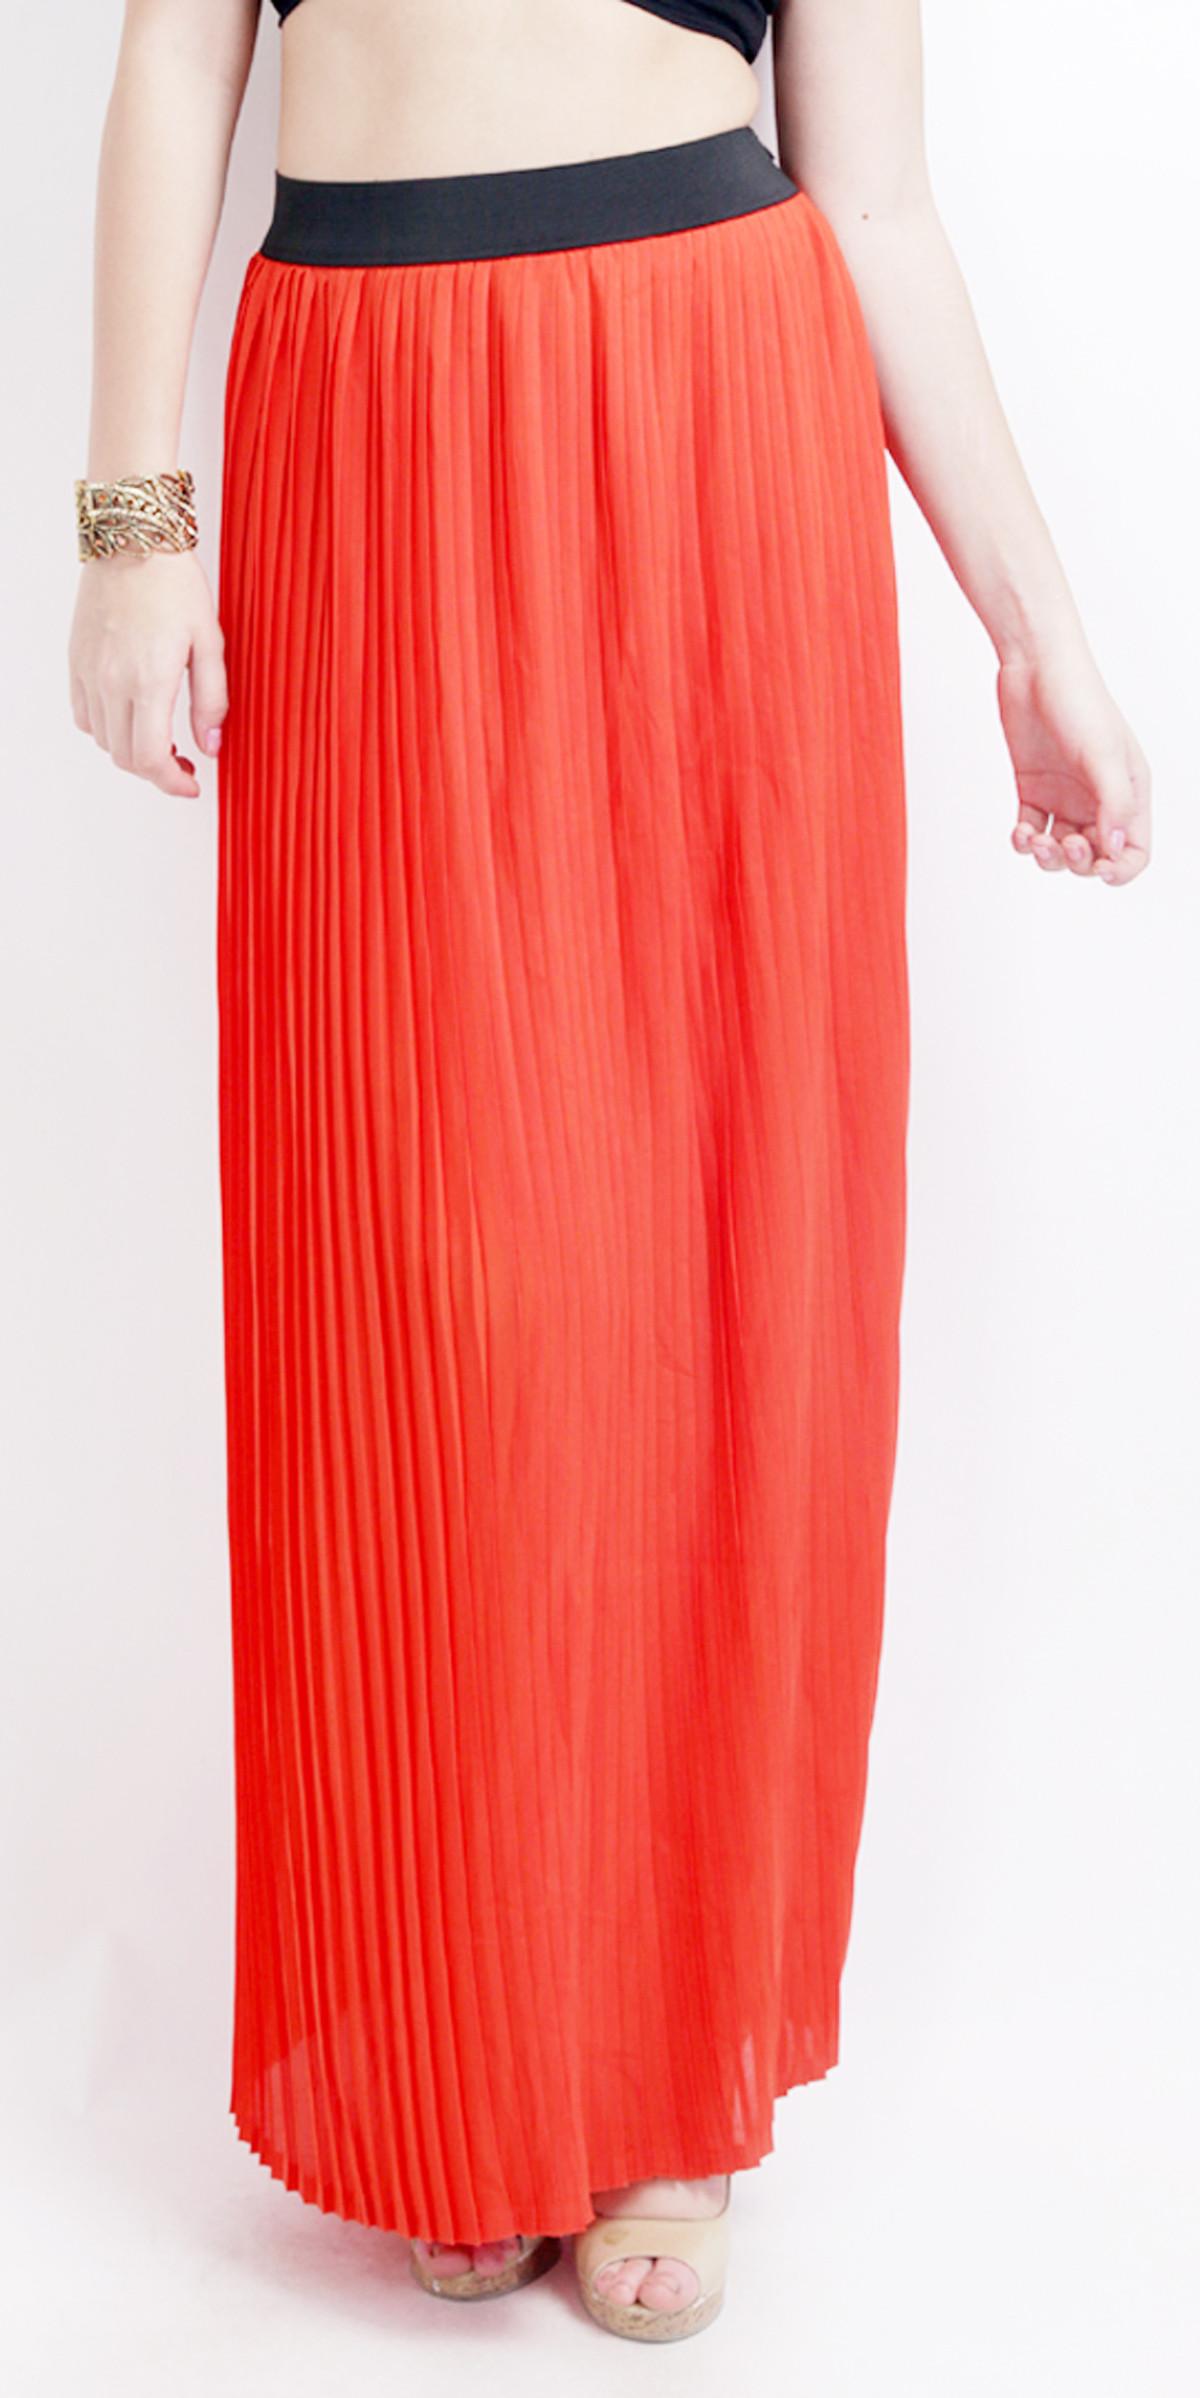 Ridress Solid Womens Pleated Orange Skirt